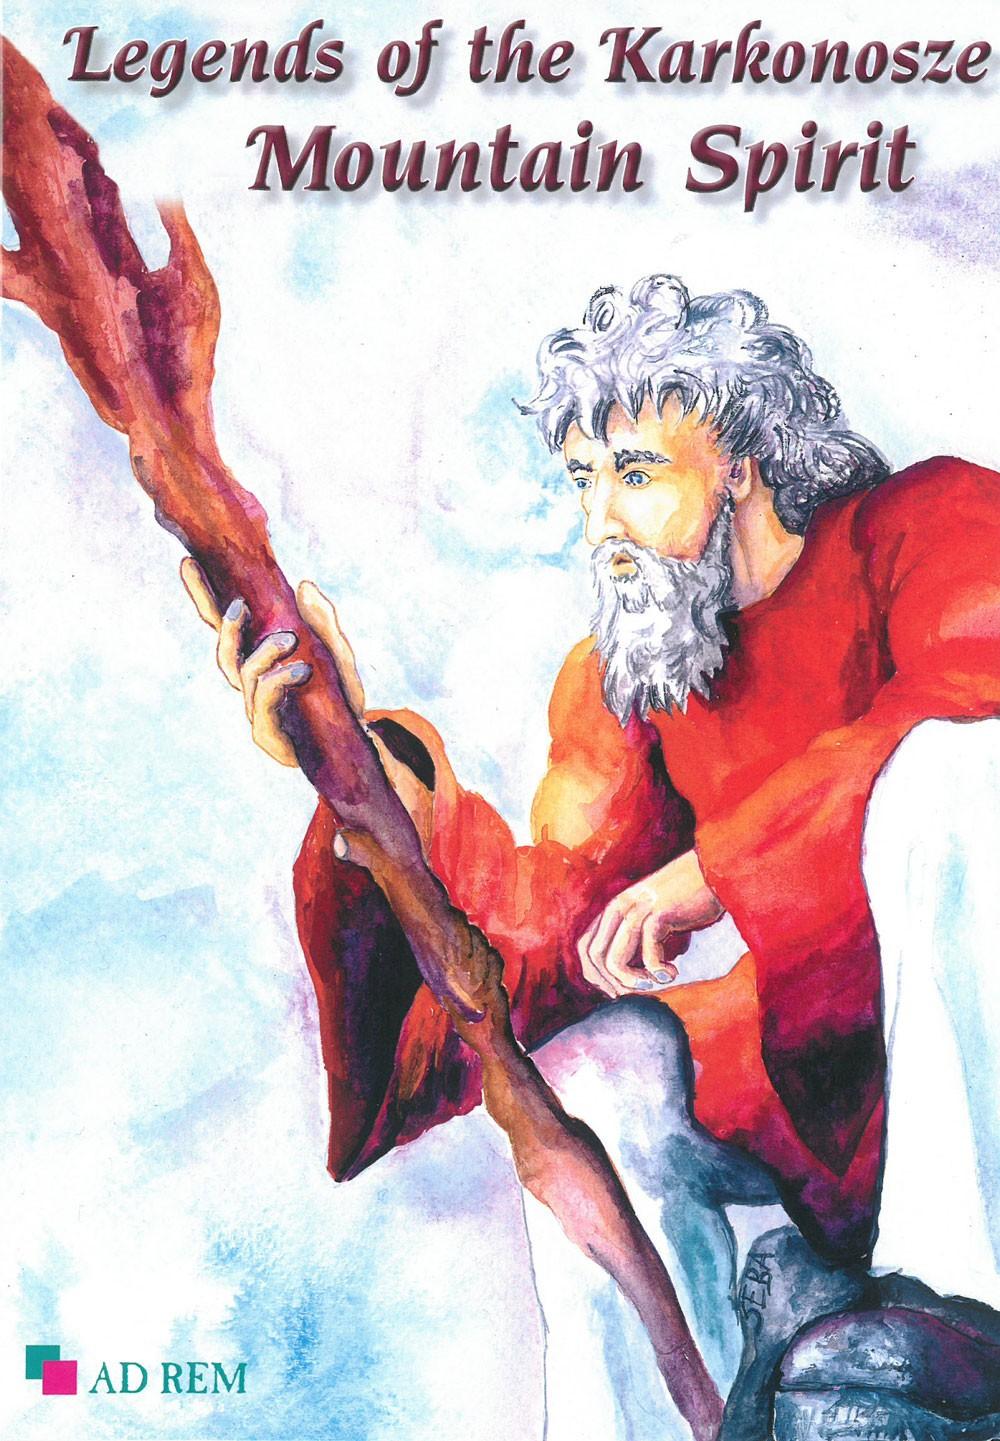 Legends of the Karkonosze Mountain Spirit